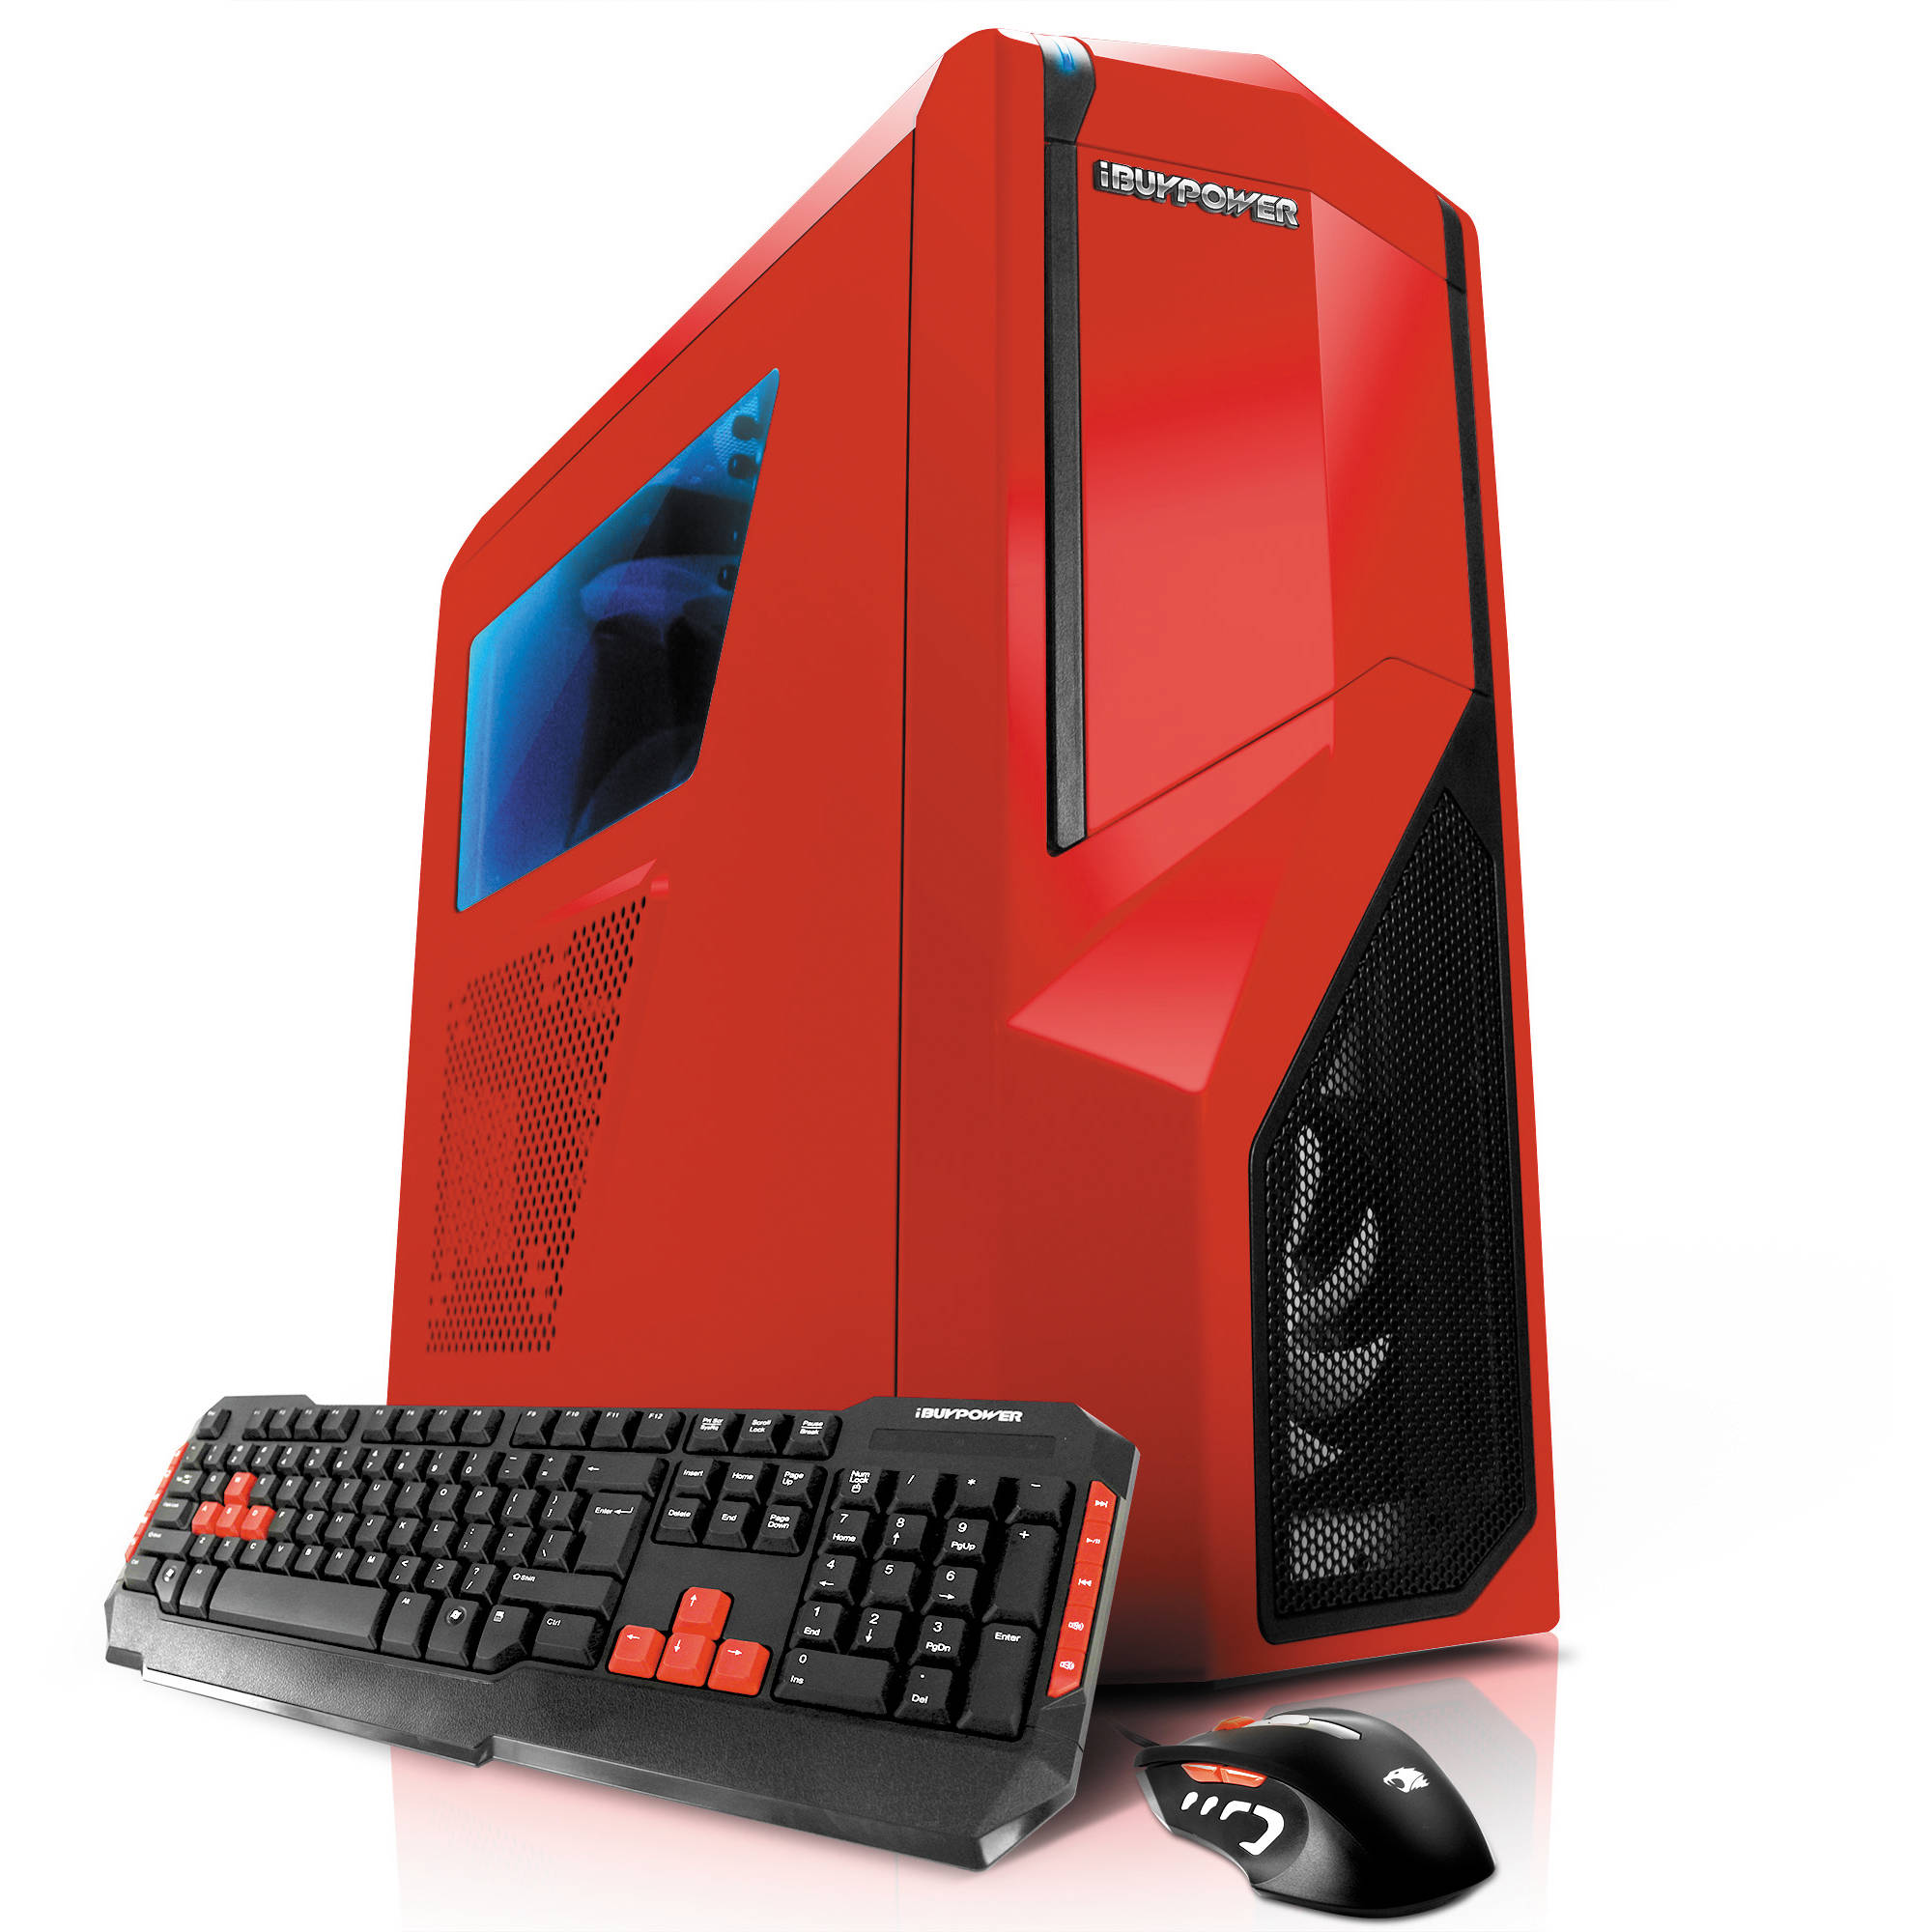 Ibuypower Na014 Desktop Computer Red Na014 B Amp H Photo Video